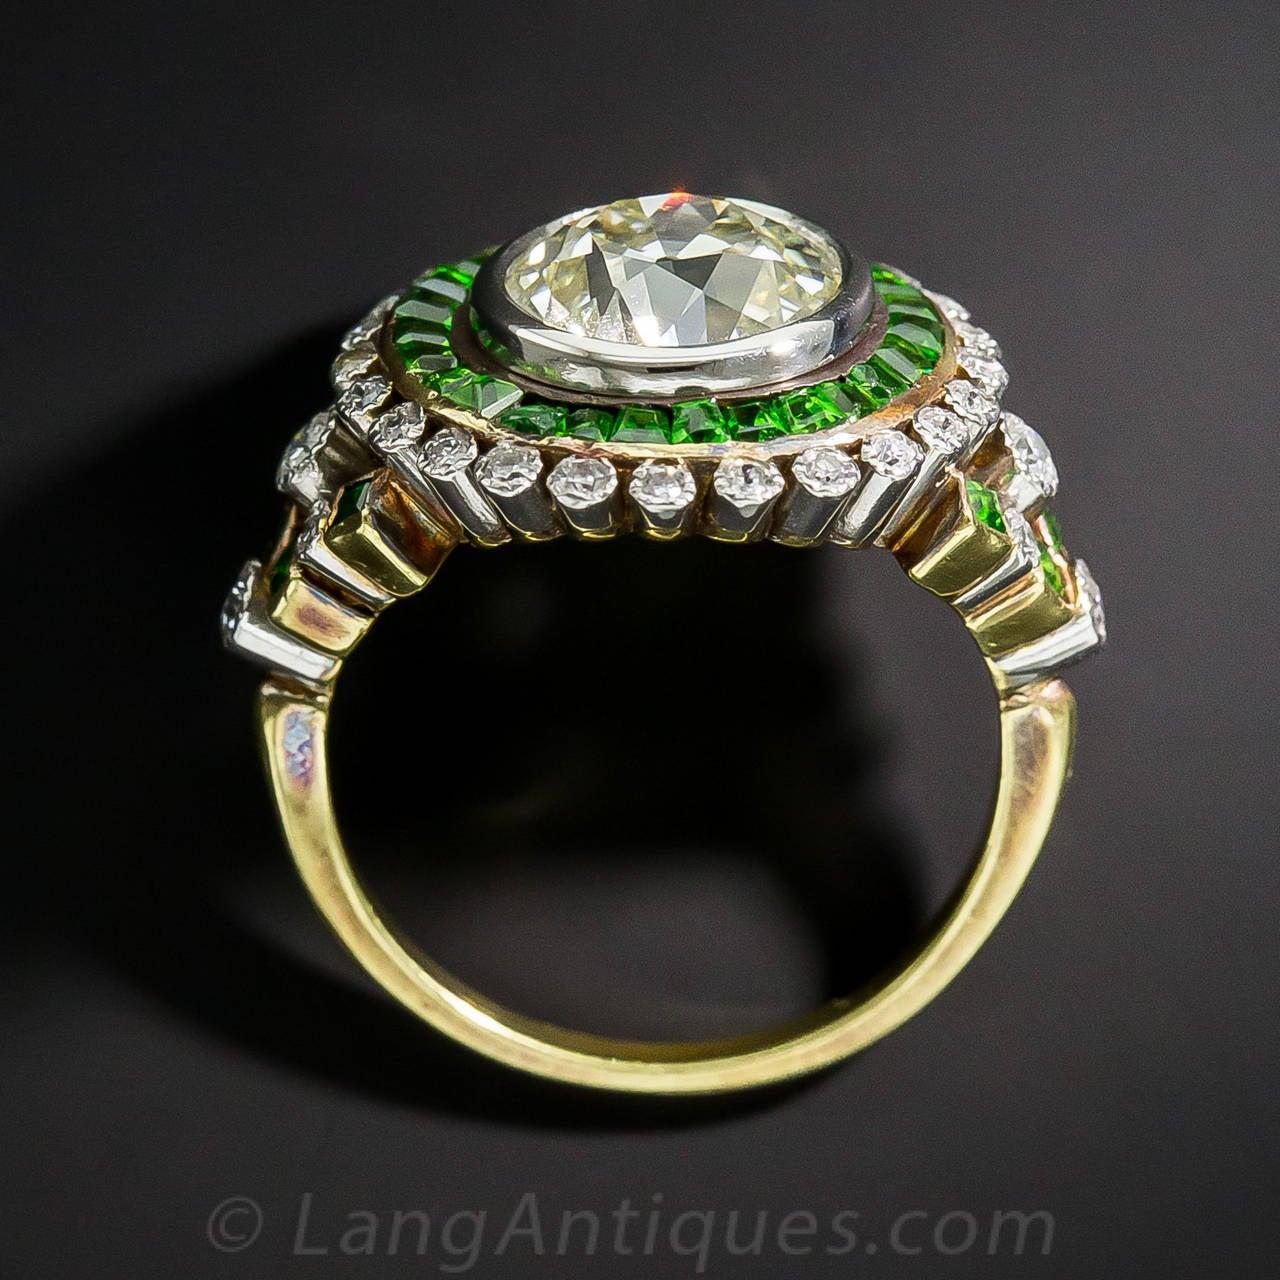 2 33 Carat European Cut Diamond Ring With Demantoid